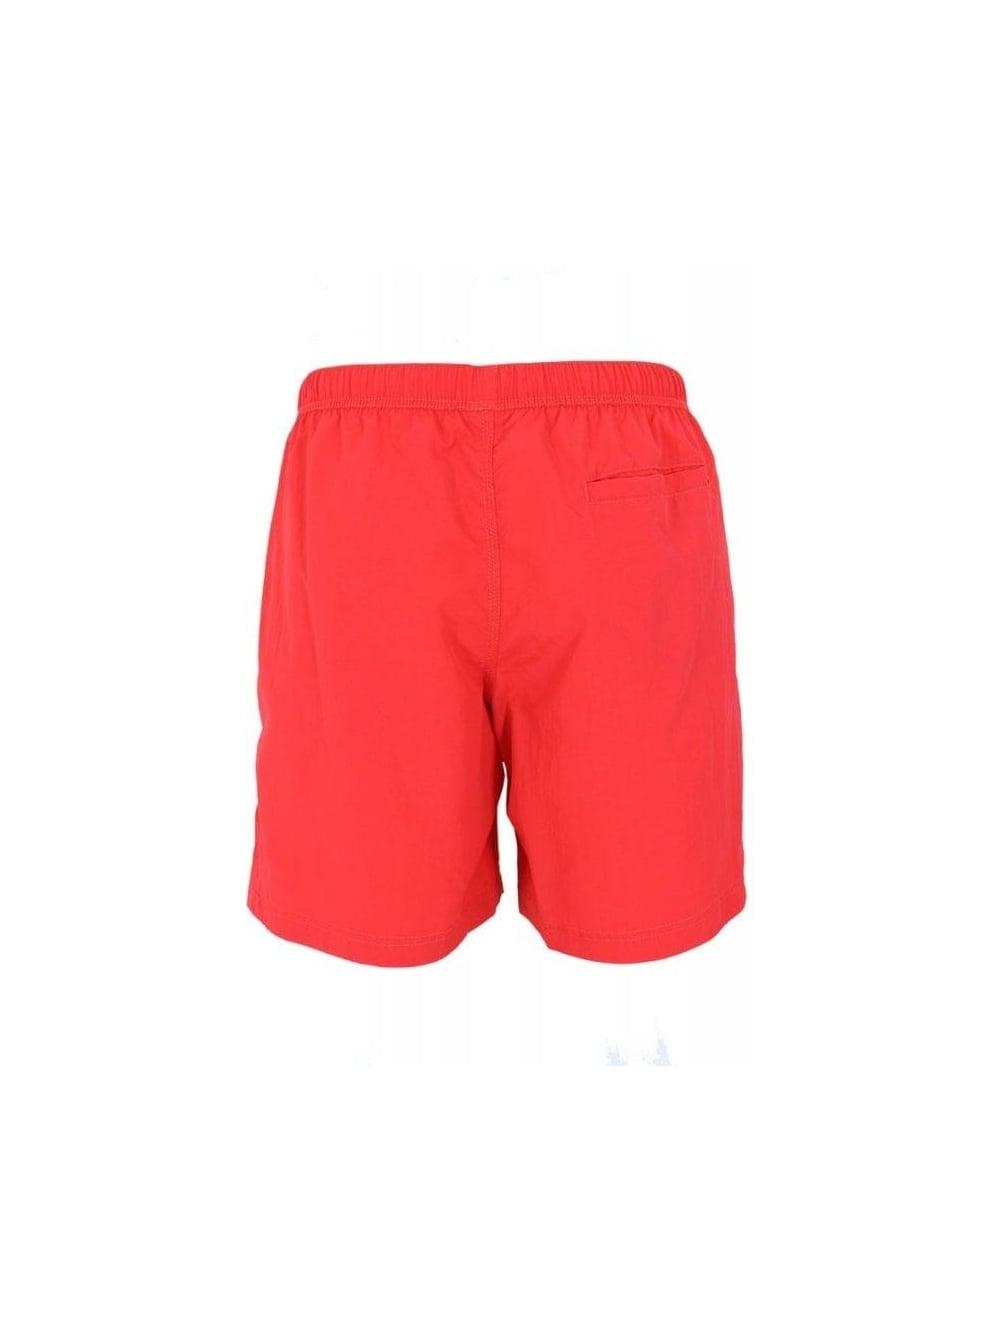 b9532ba19a Adidas Originals Swimming Shorts in Vivid Red - Northern Threads